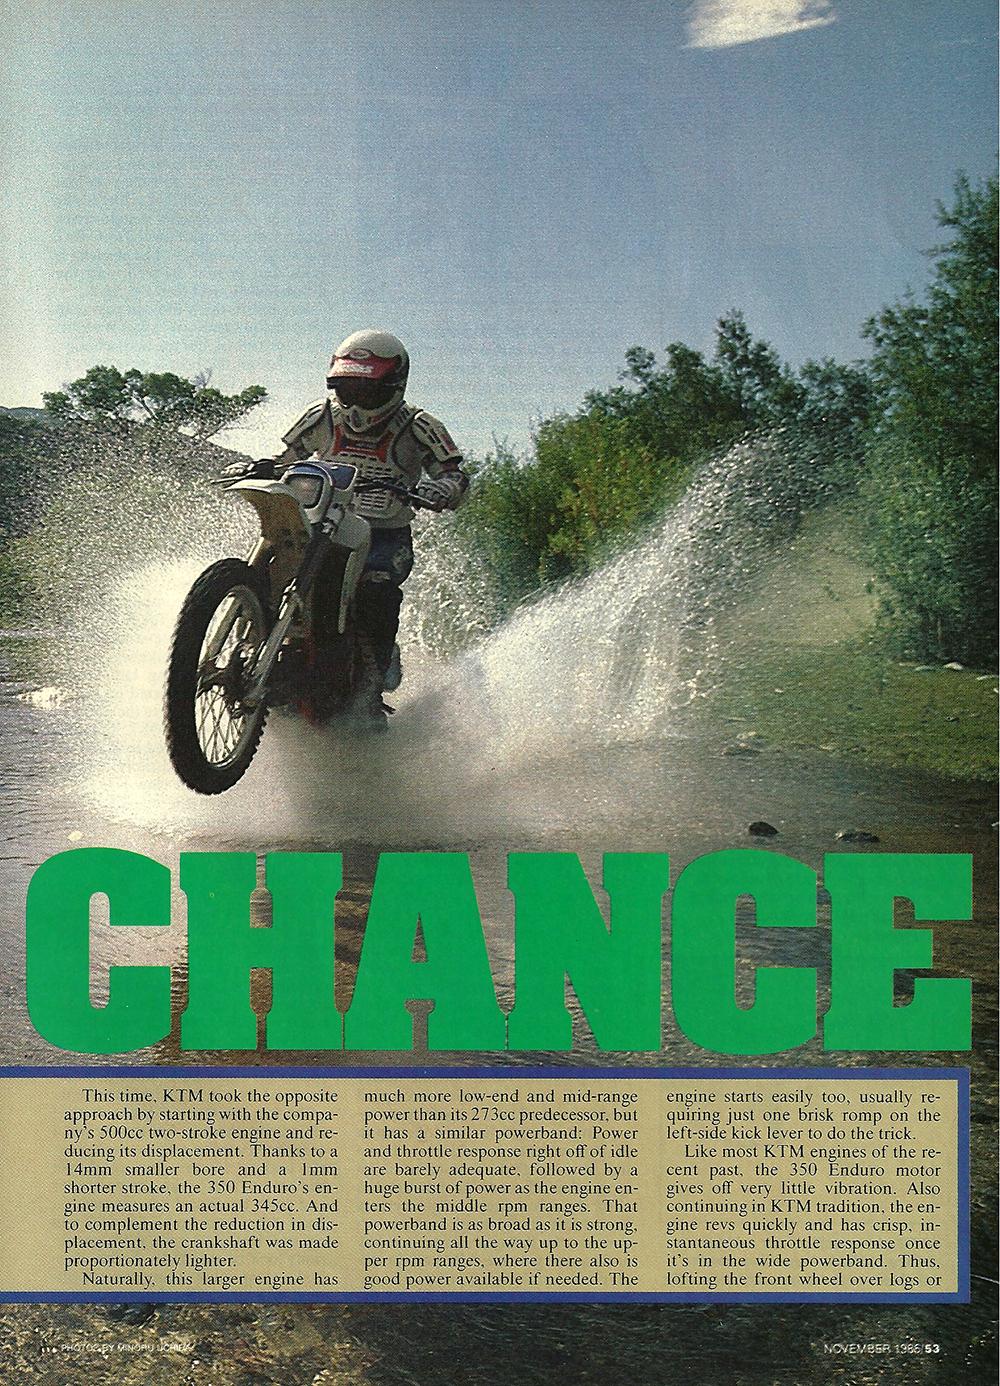 1986 KTM 350 enduro road test 02.jpg